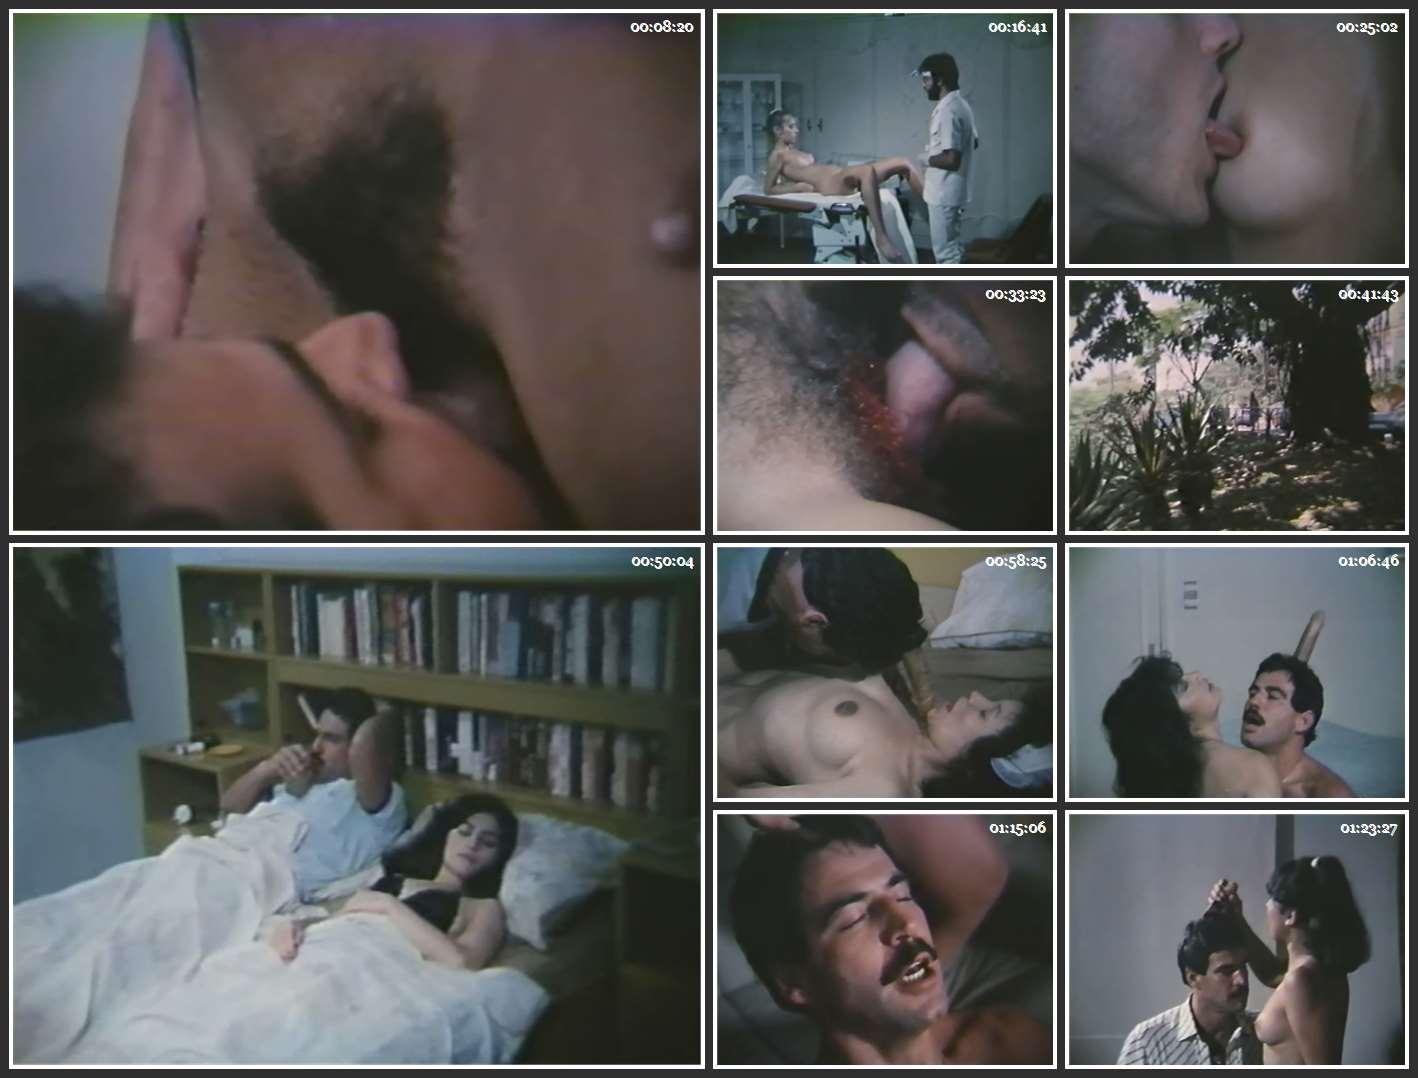 Senta_no_meu_que_Eu_Entro_na_Tua_-_1985_-_BRASIL_-_Cine_Nacional_-_Pornocanchada_-_5.avi.jpg